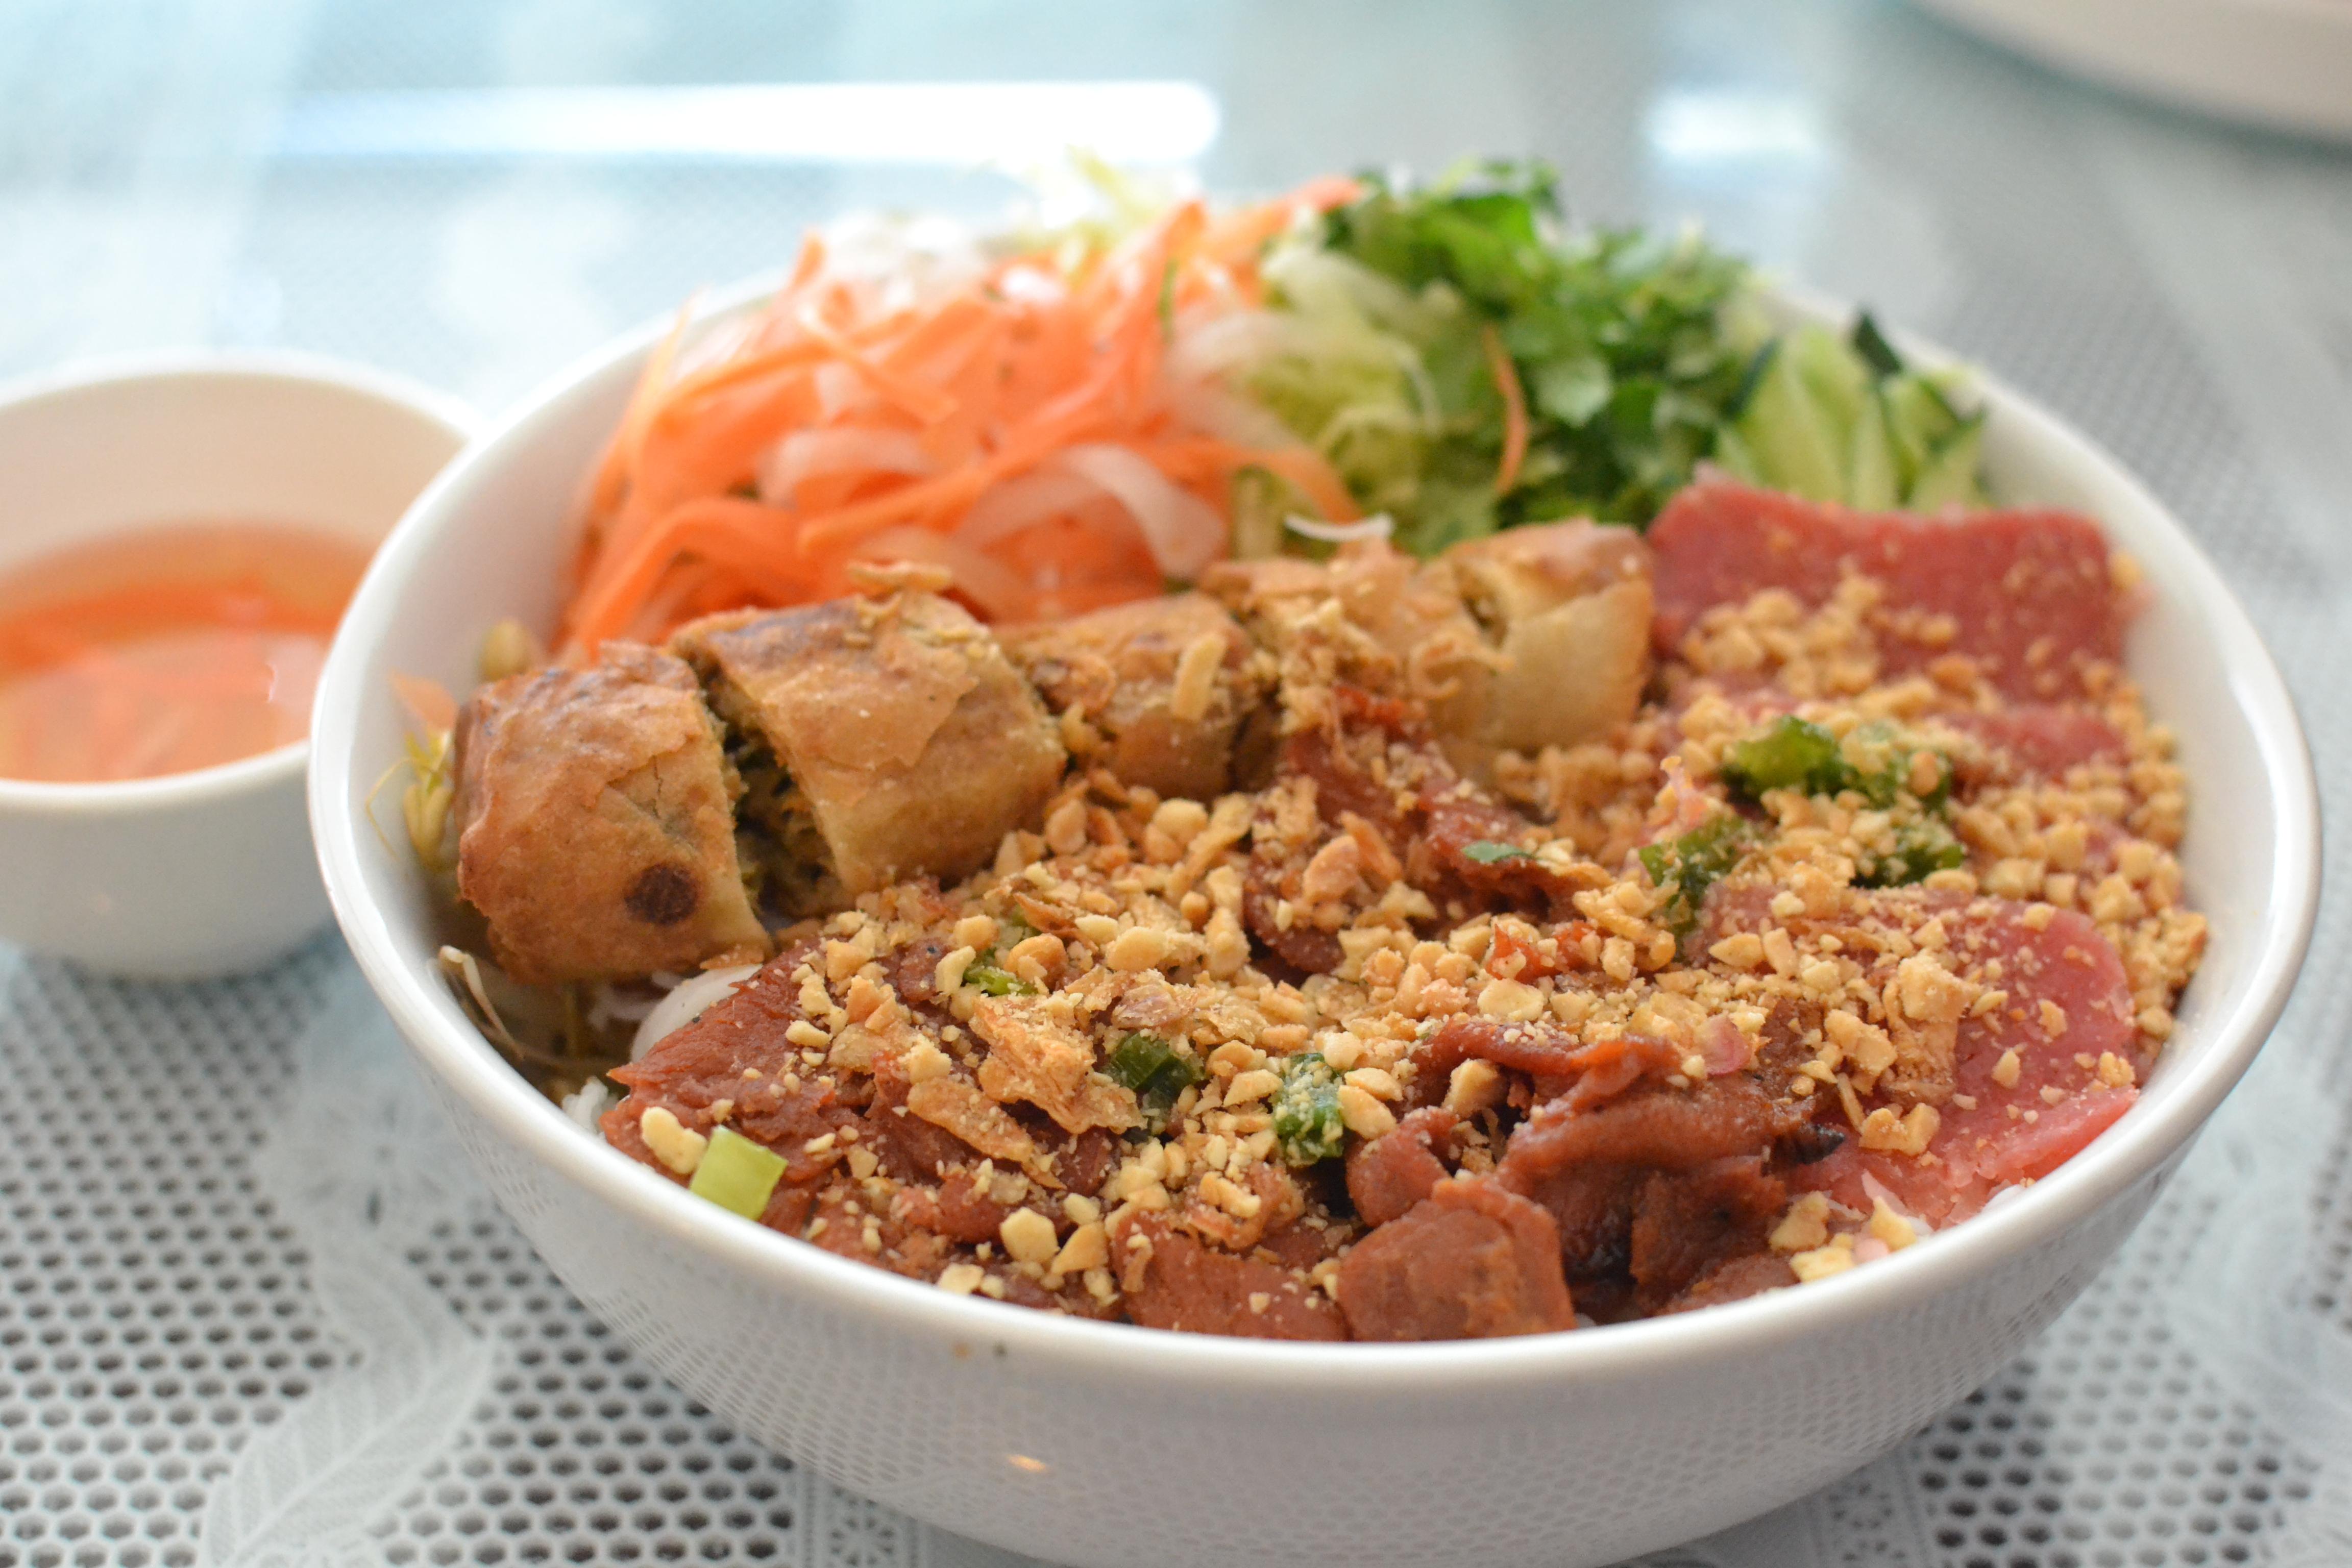 59.) Bun Thit Nuong Cha Gio Nem Chua